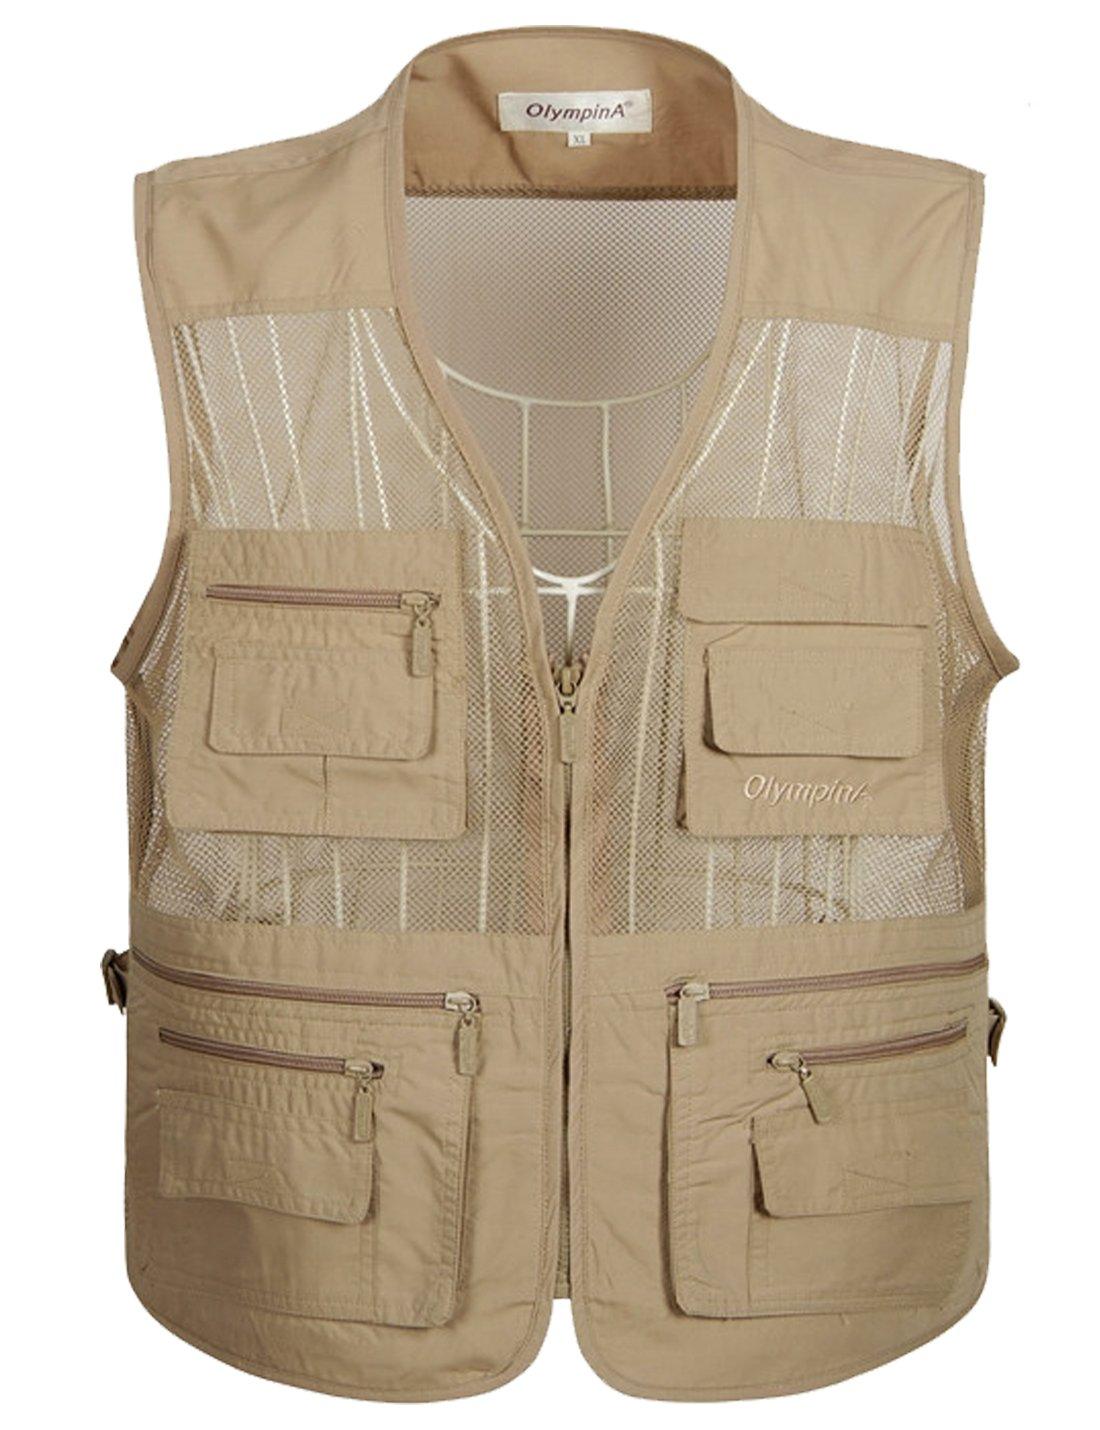 Flygo Men's Summer Mesh Fishing Vest Photography Work Multi-Pockets Outdoors Journalist's Vest Sleeveless Jacket (XX-Large, Khaki)